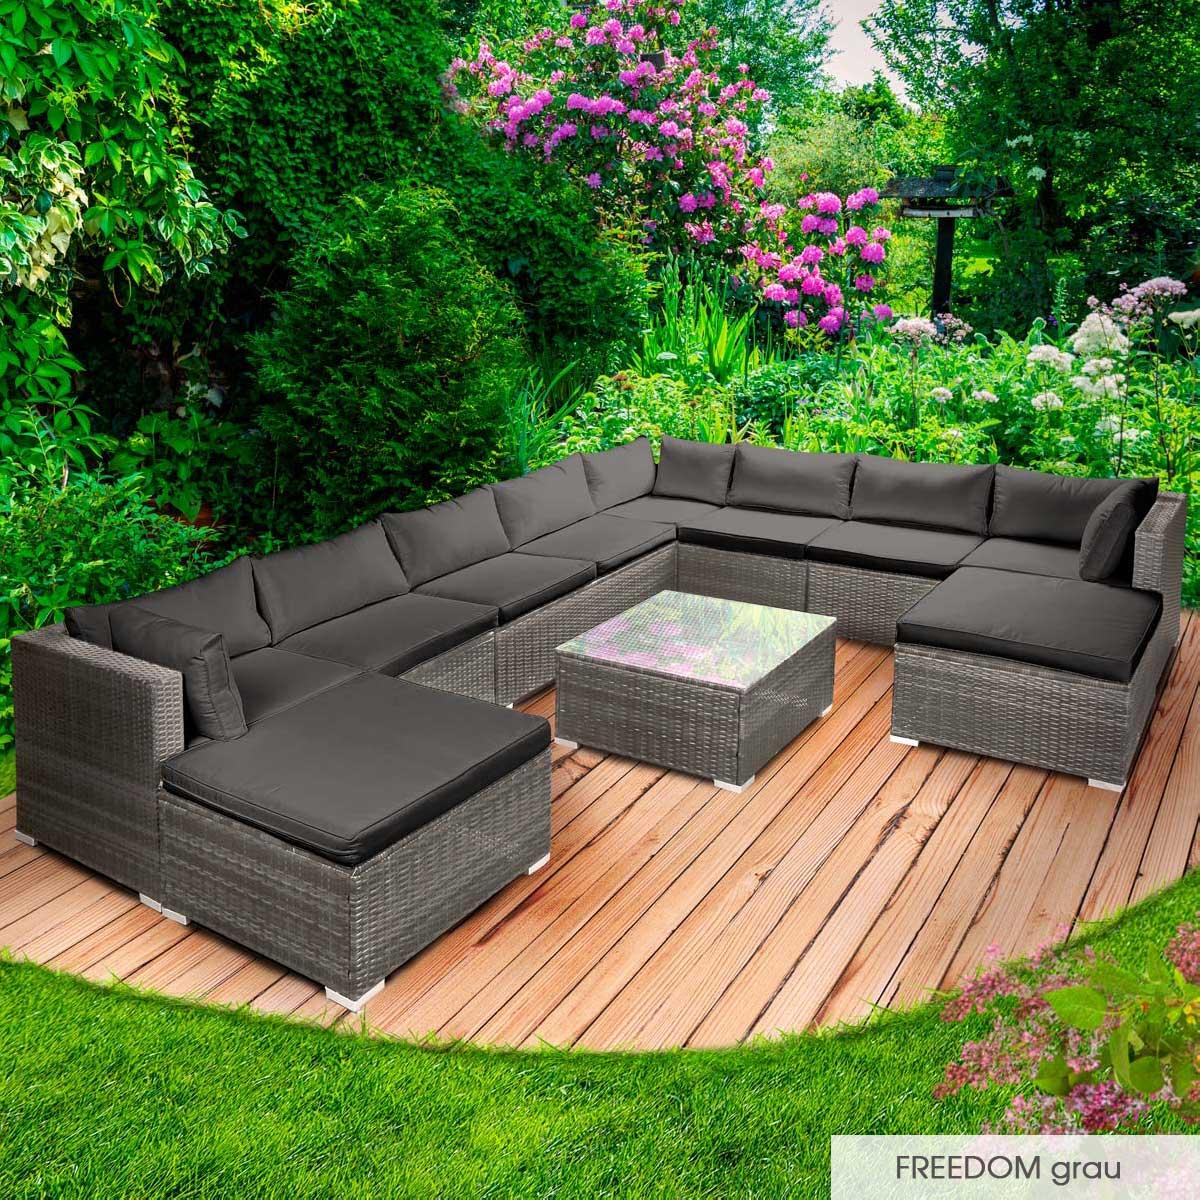 Gartenmoebel-Poly-Rattan-Lounge-Moebel-Sitzgarnitur-Gartengarnitur-Sitzgruppe-Sofa Indexbild 48